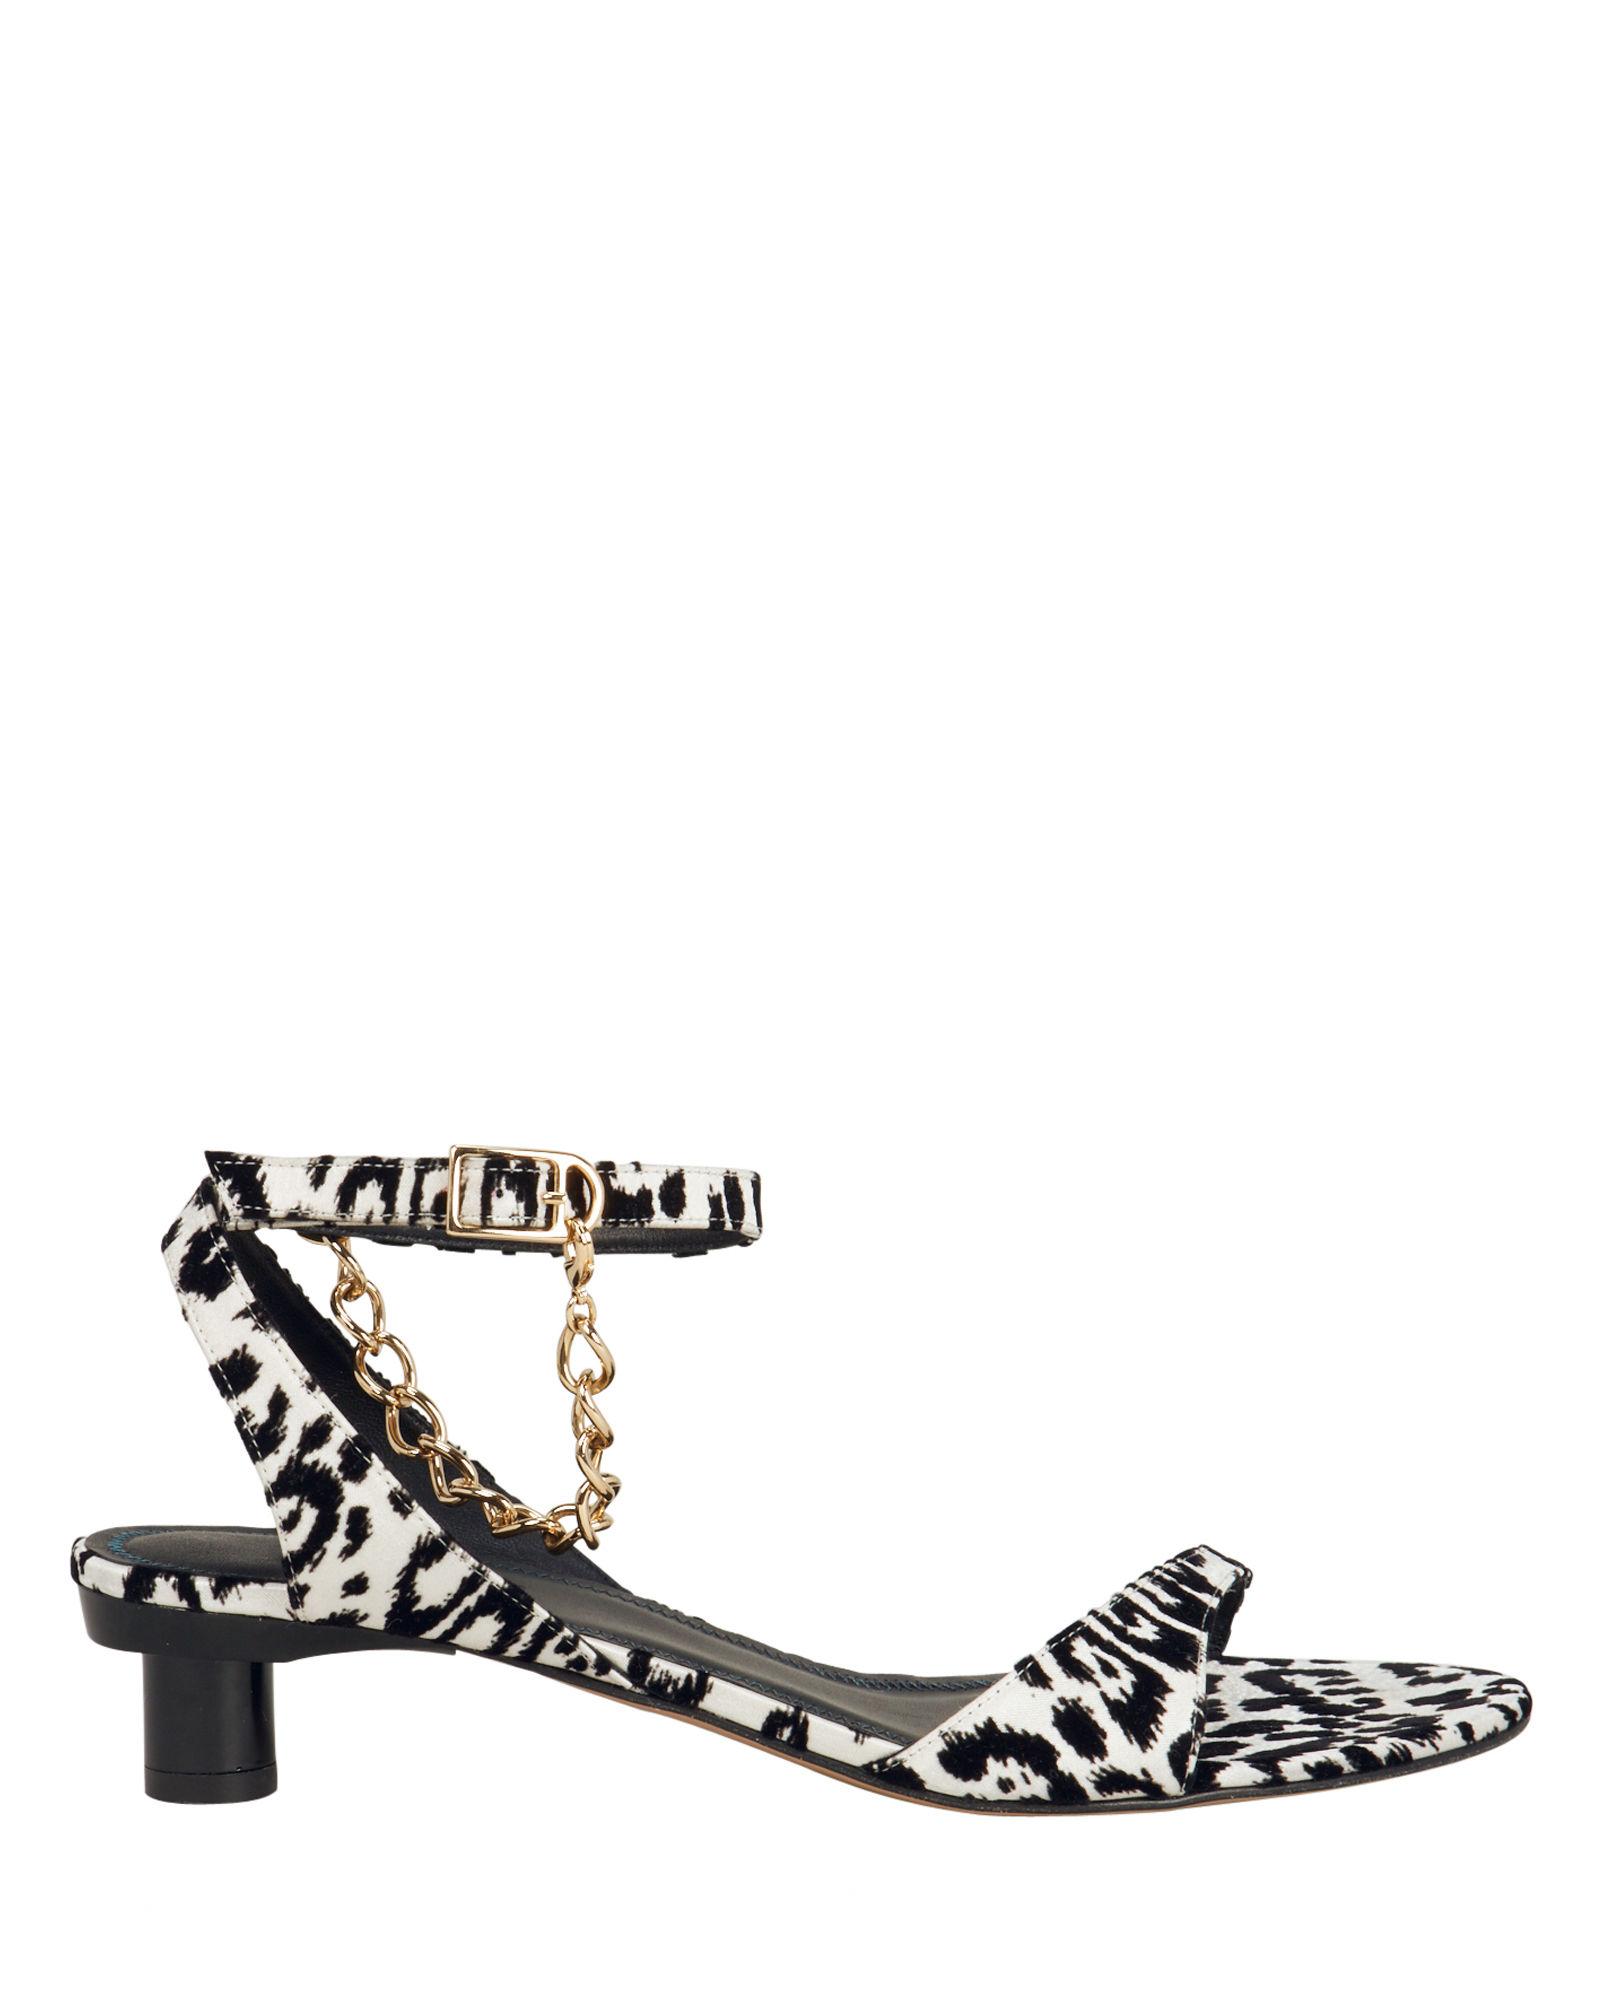 Nathan Dalmatian Chain Kitten Heels